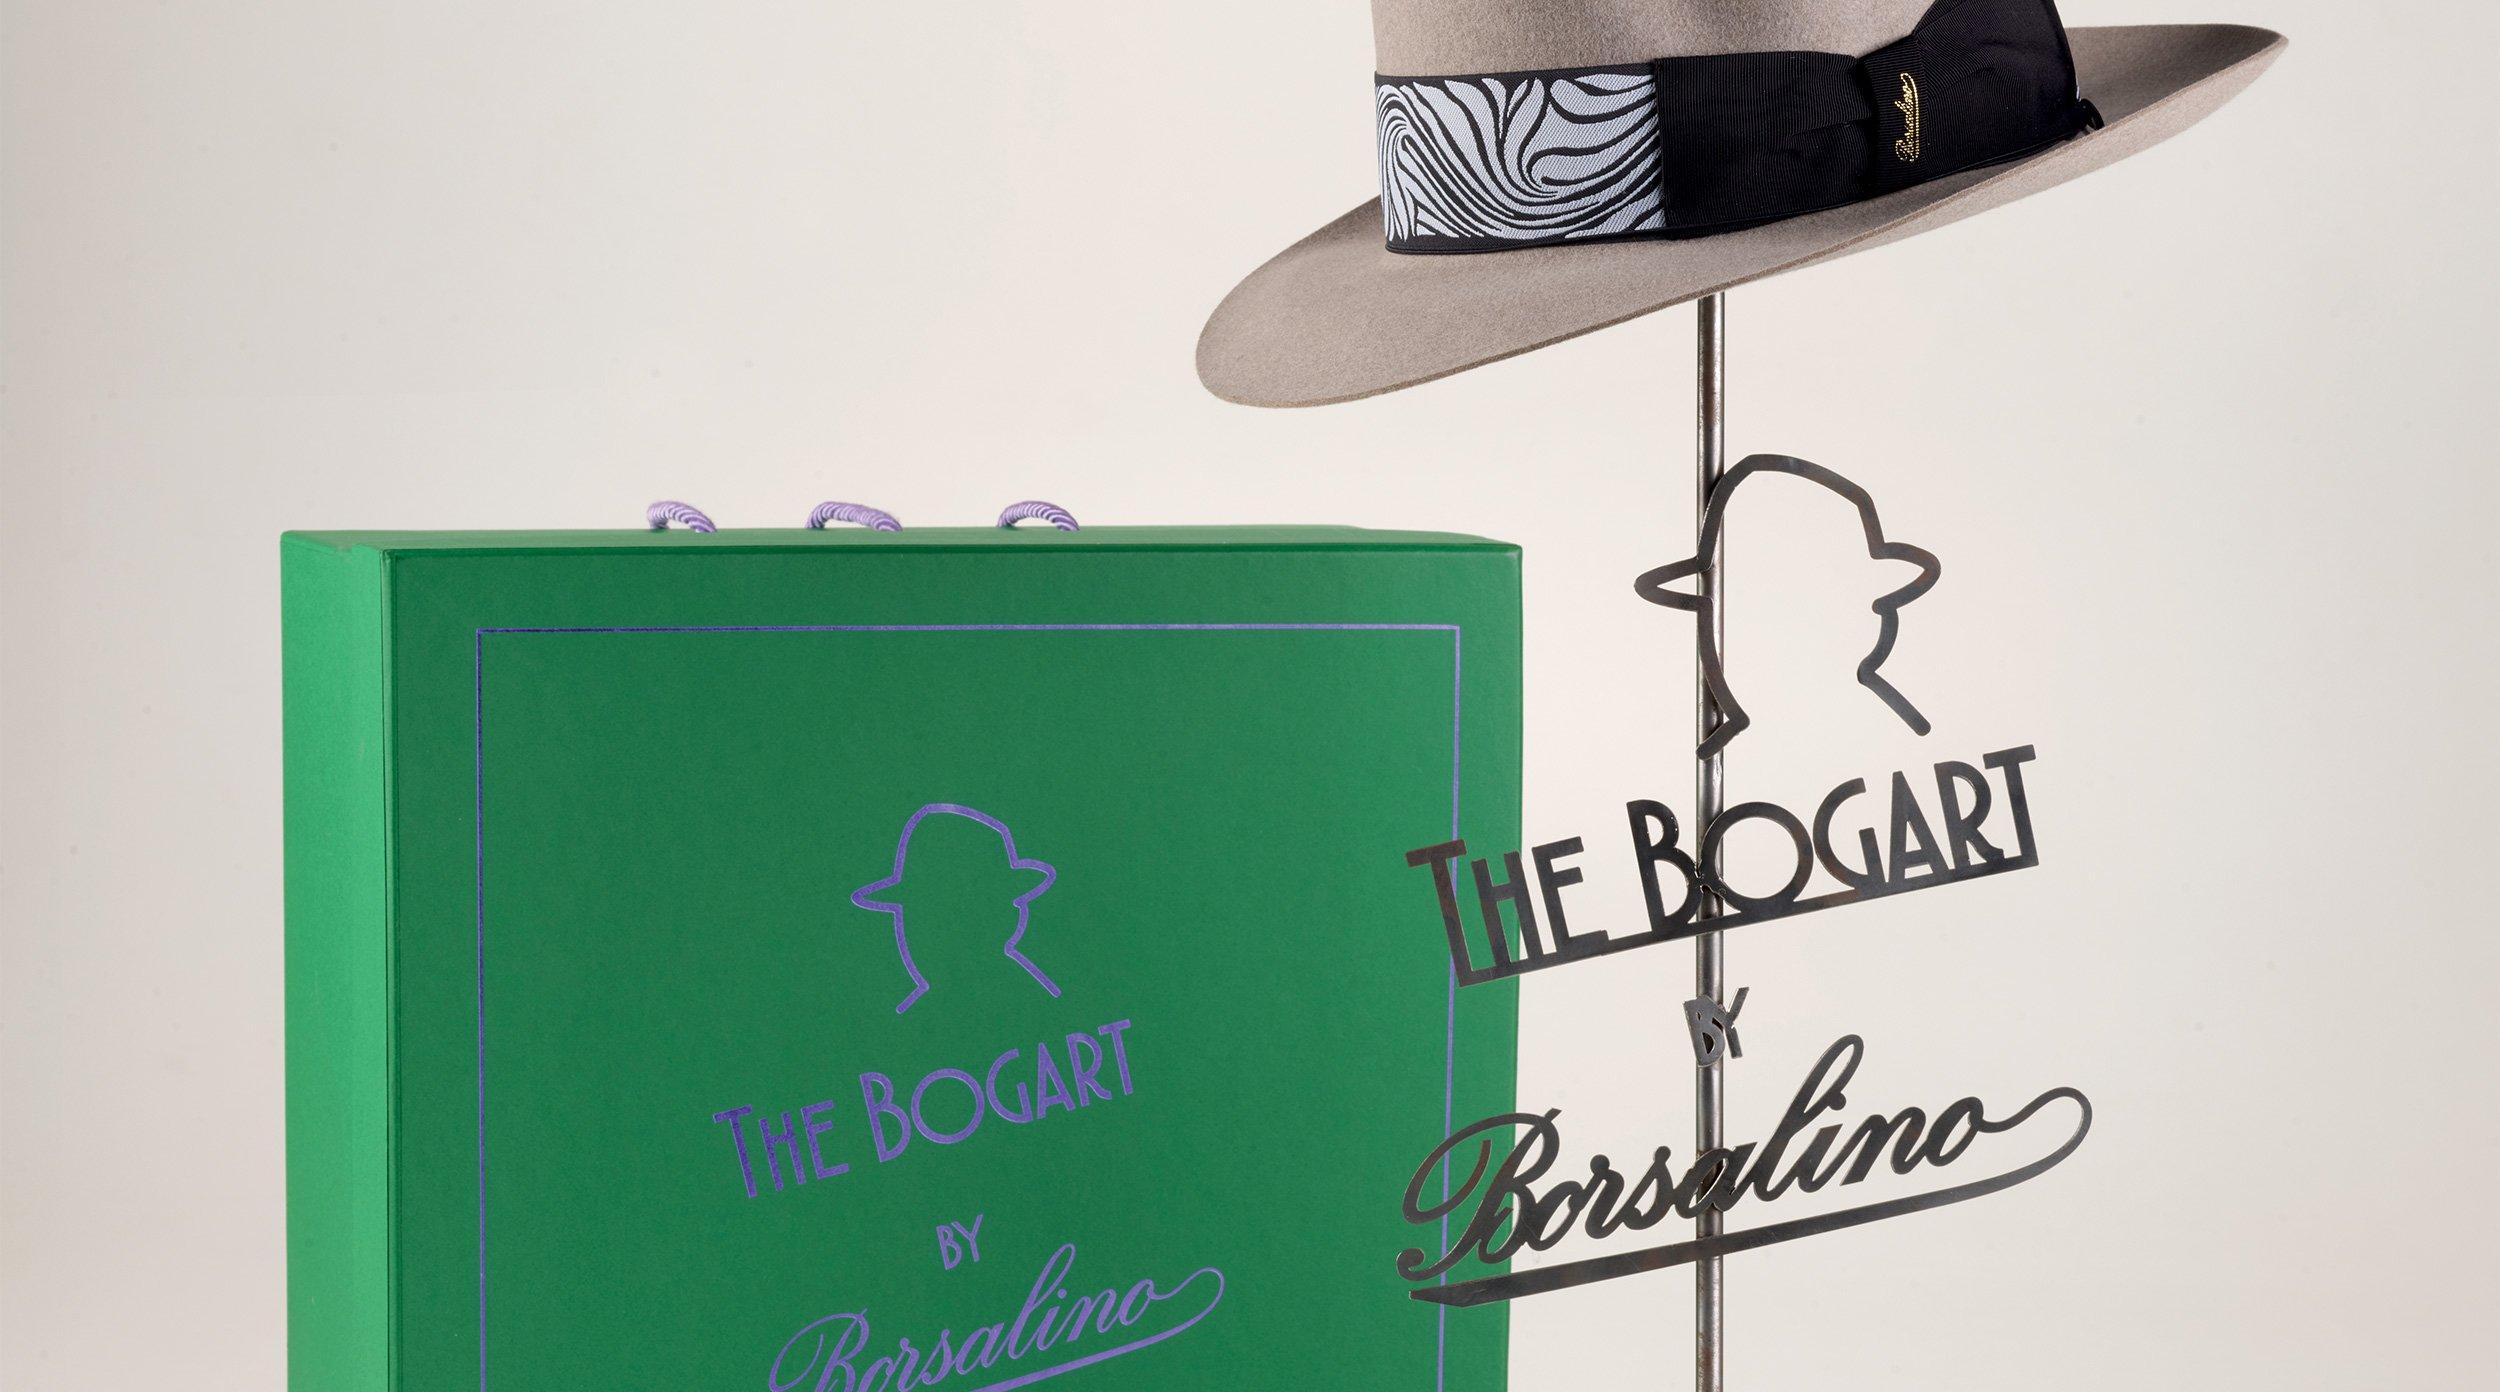 INTRODUCING THE BOGART BY BORSALINO